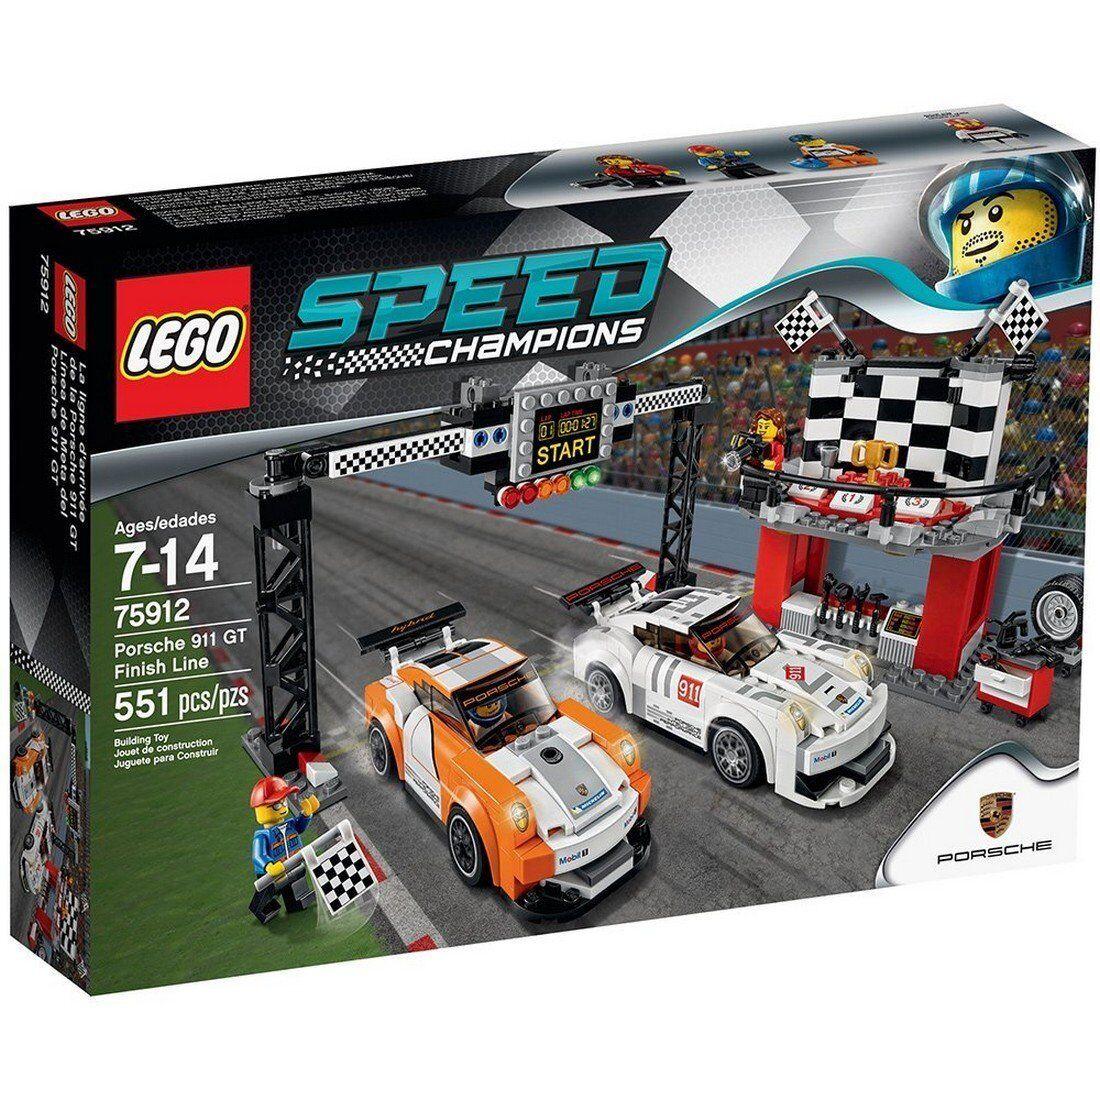 NEW LEGO Speed Champions Porsche 911GT Finish Line 75912